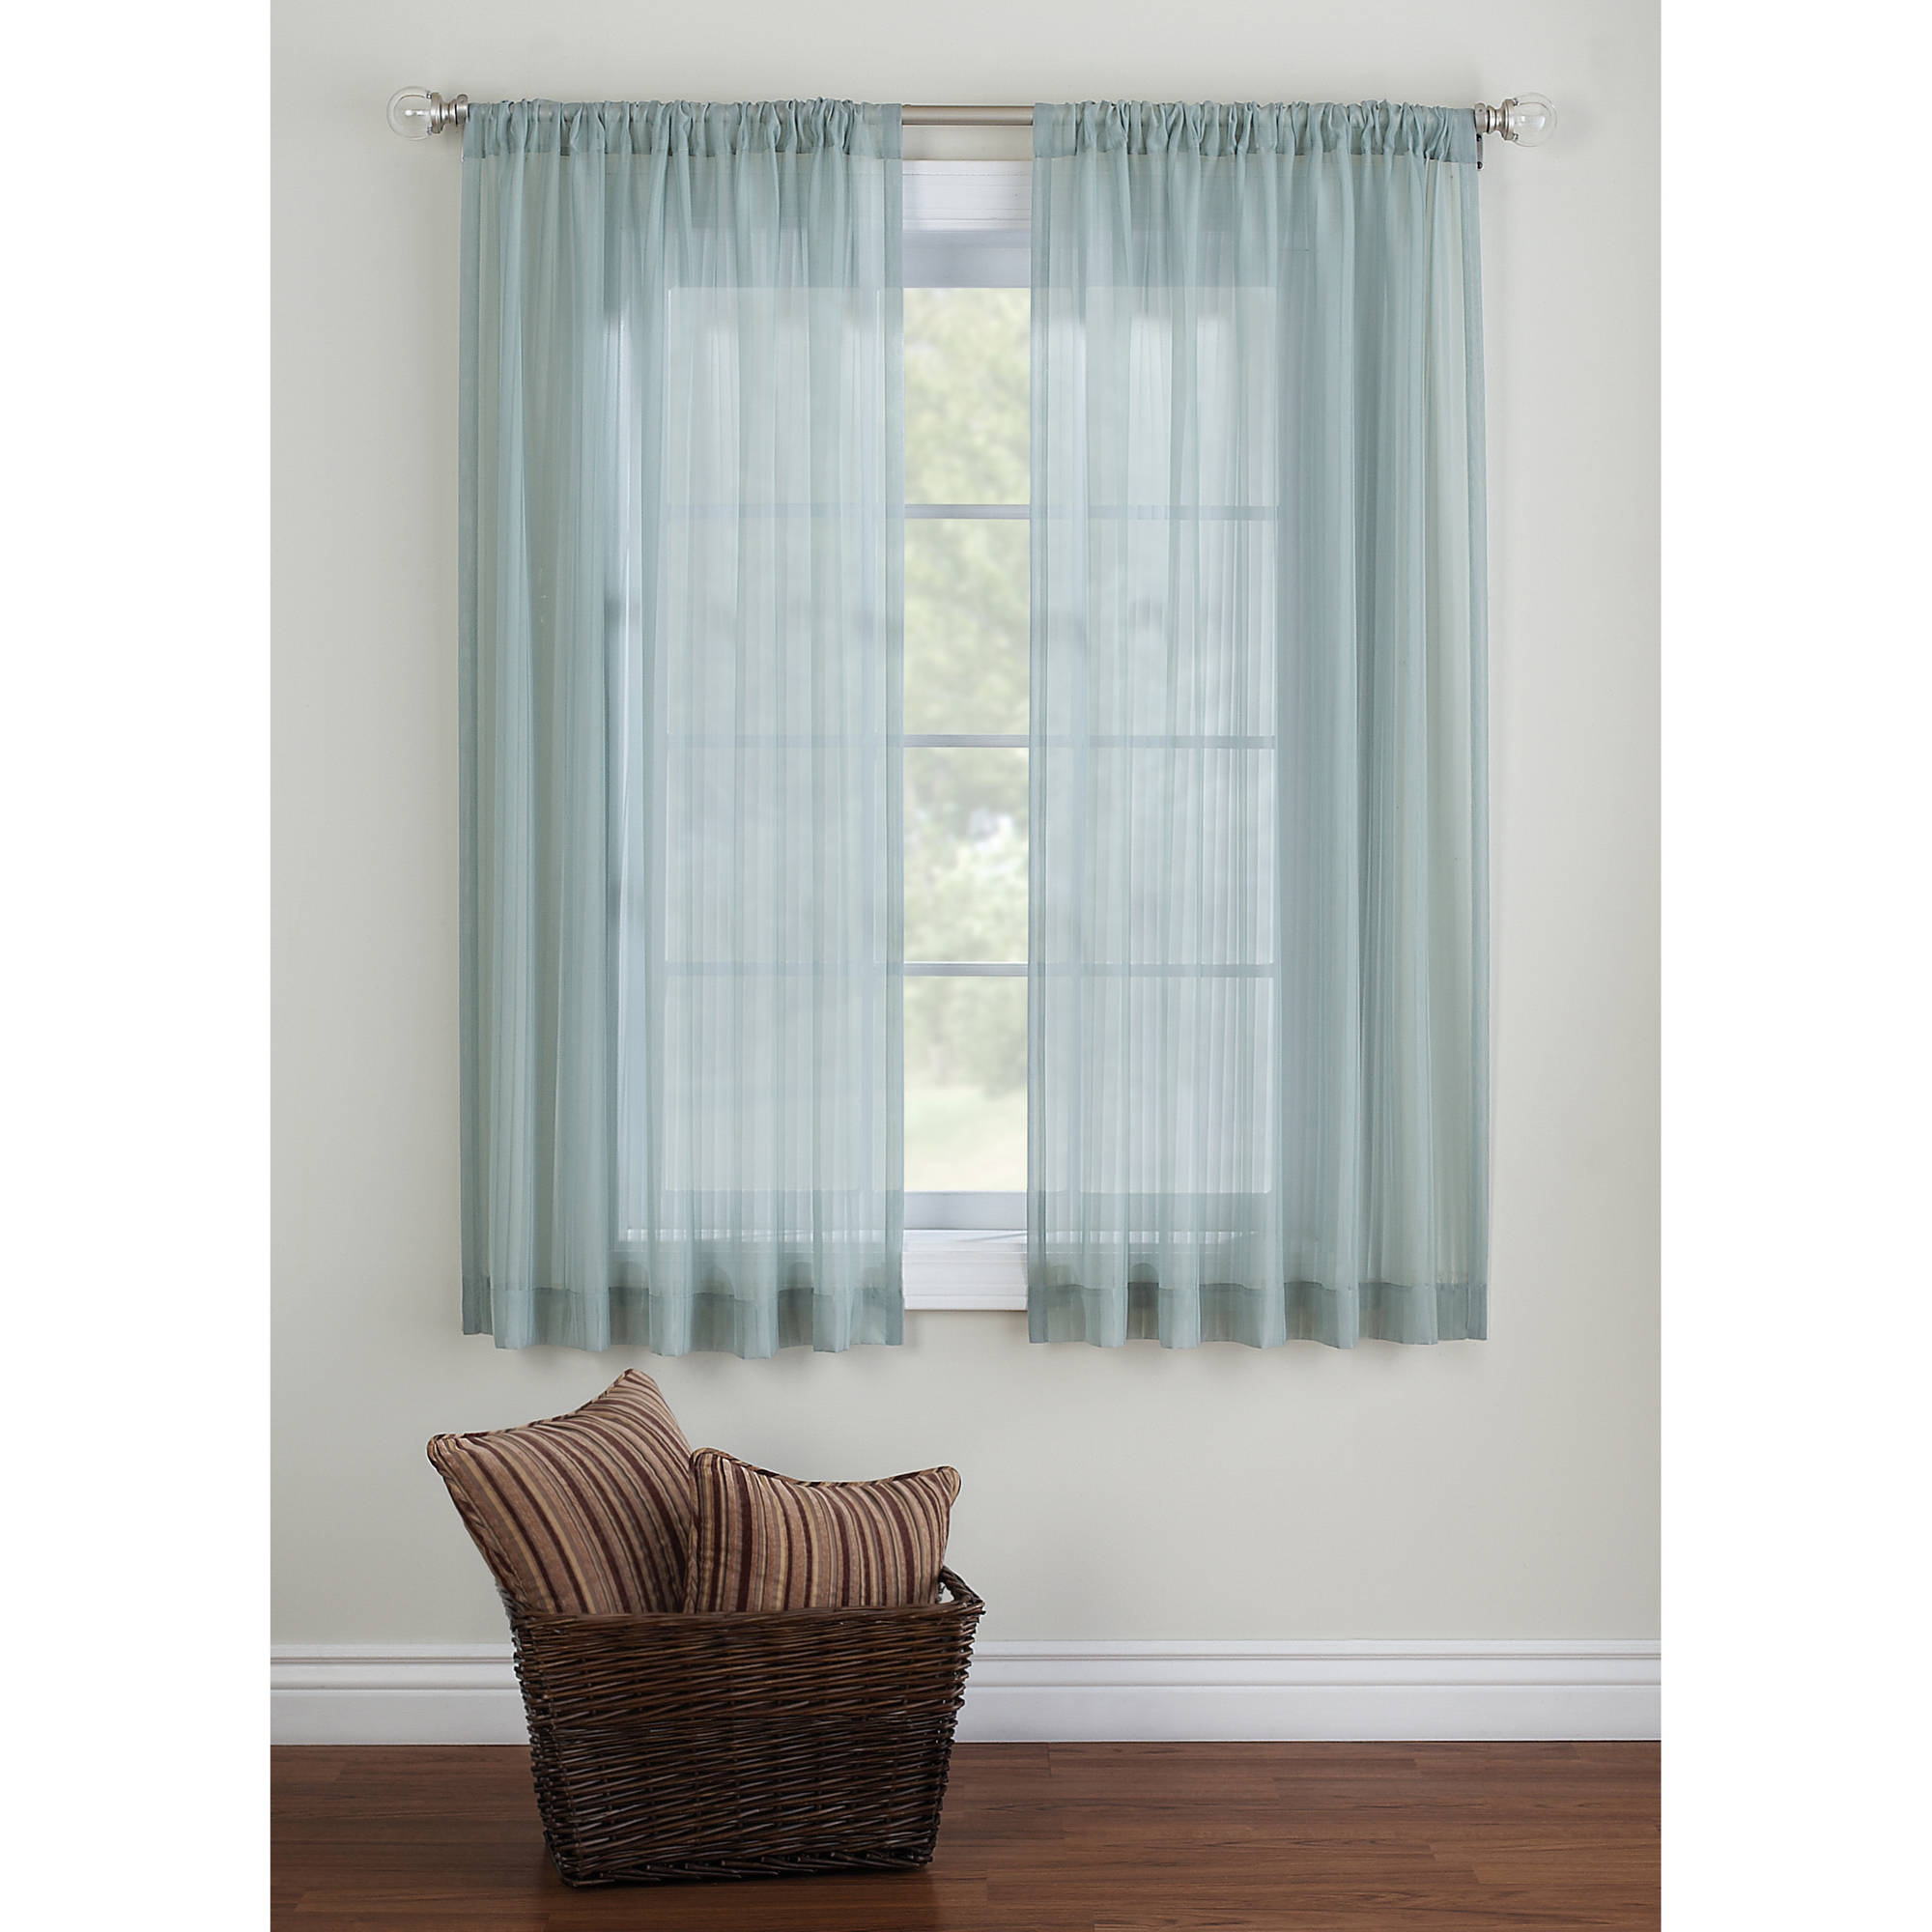 Delancey Metallic Print Sheer Grommet Window Panel Walmart For Curtains Windows (View 10 of 25)